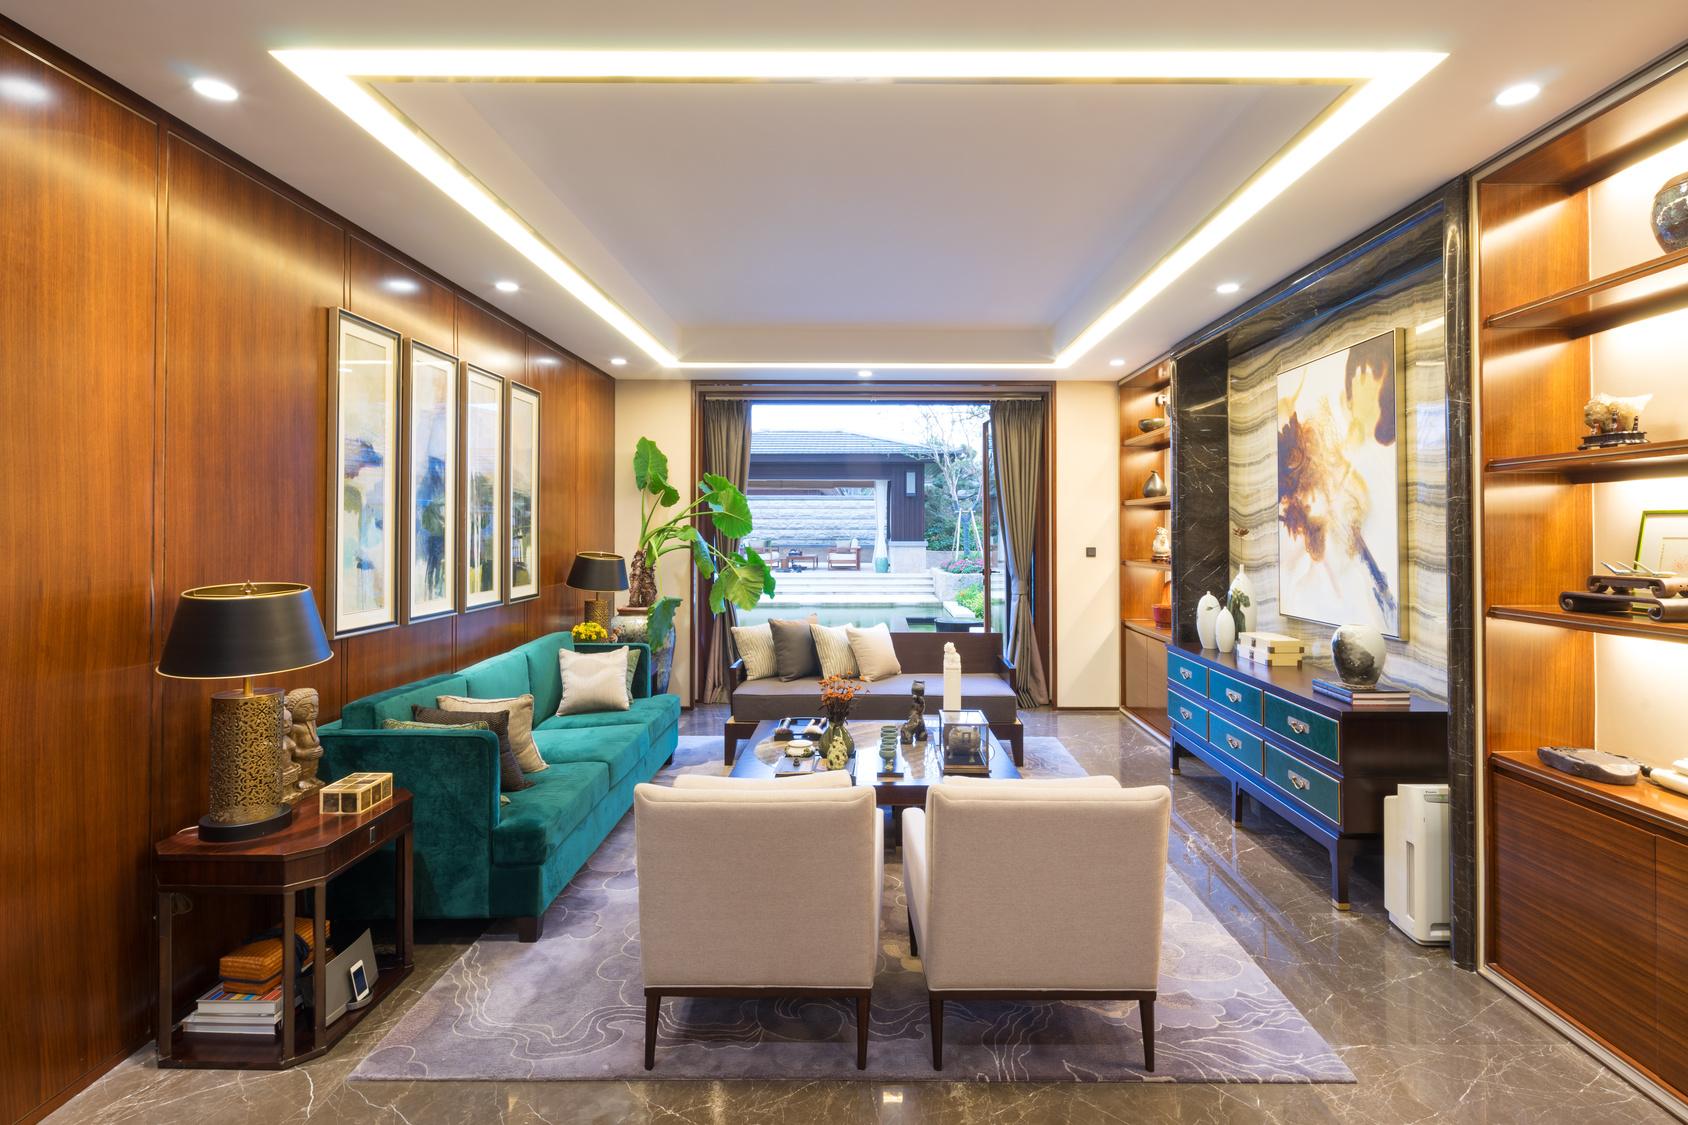 Lumiere-Juliens-Wood-plafond-et-mur-tendu-isolation-montpellier-herault-2